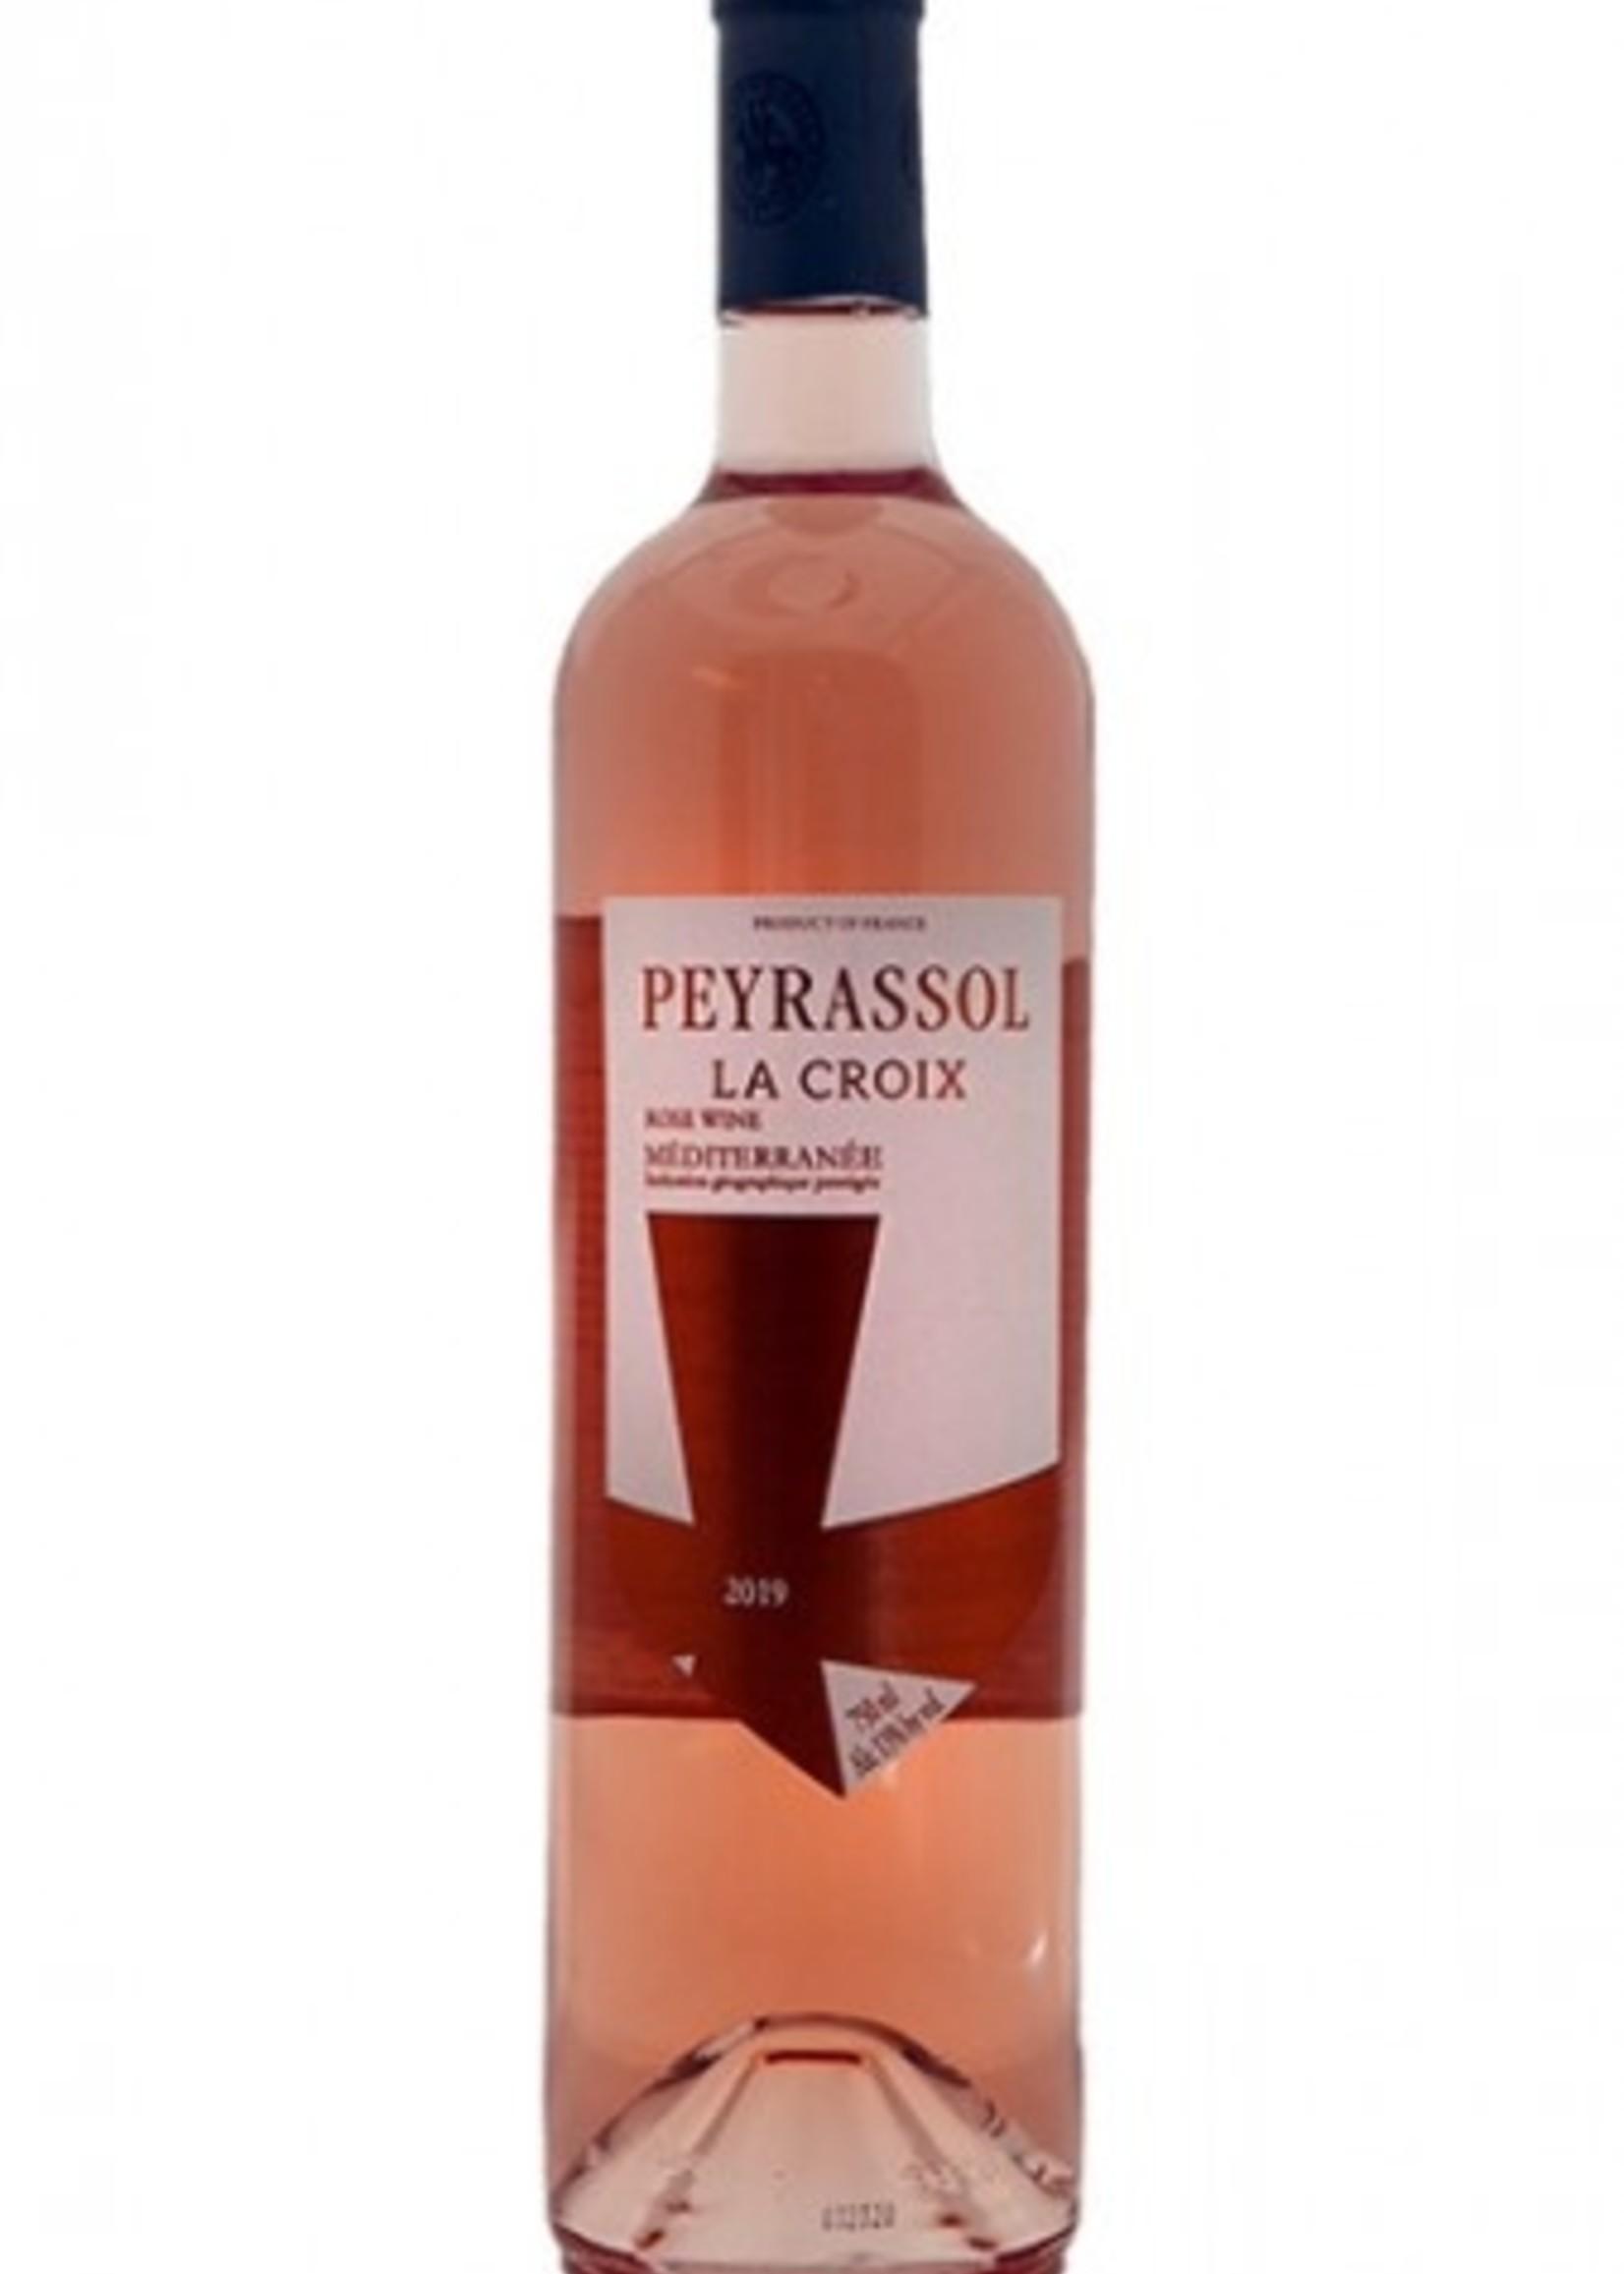 Peyrassol La Croix Rose, France